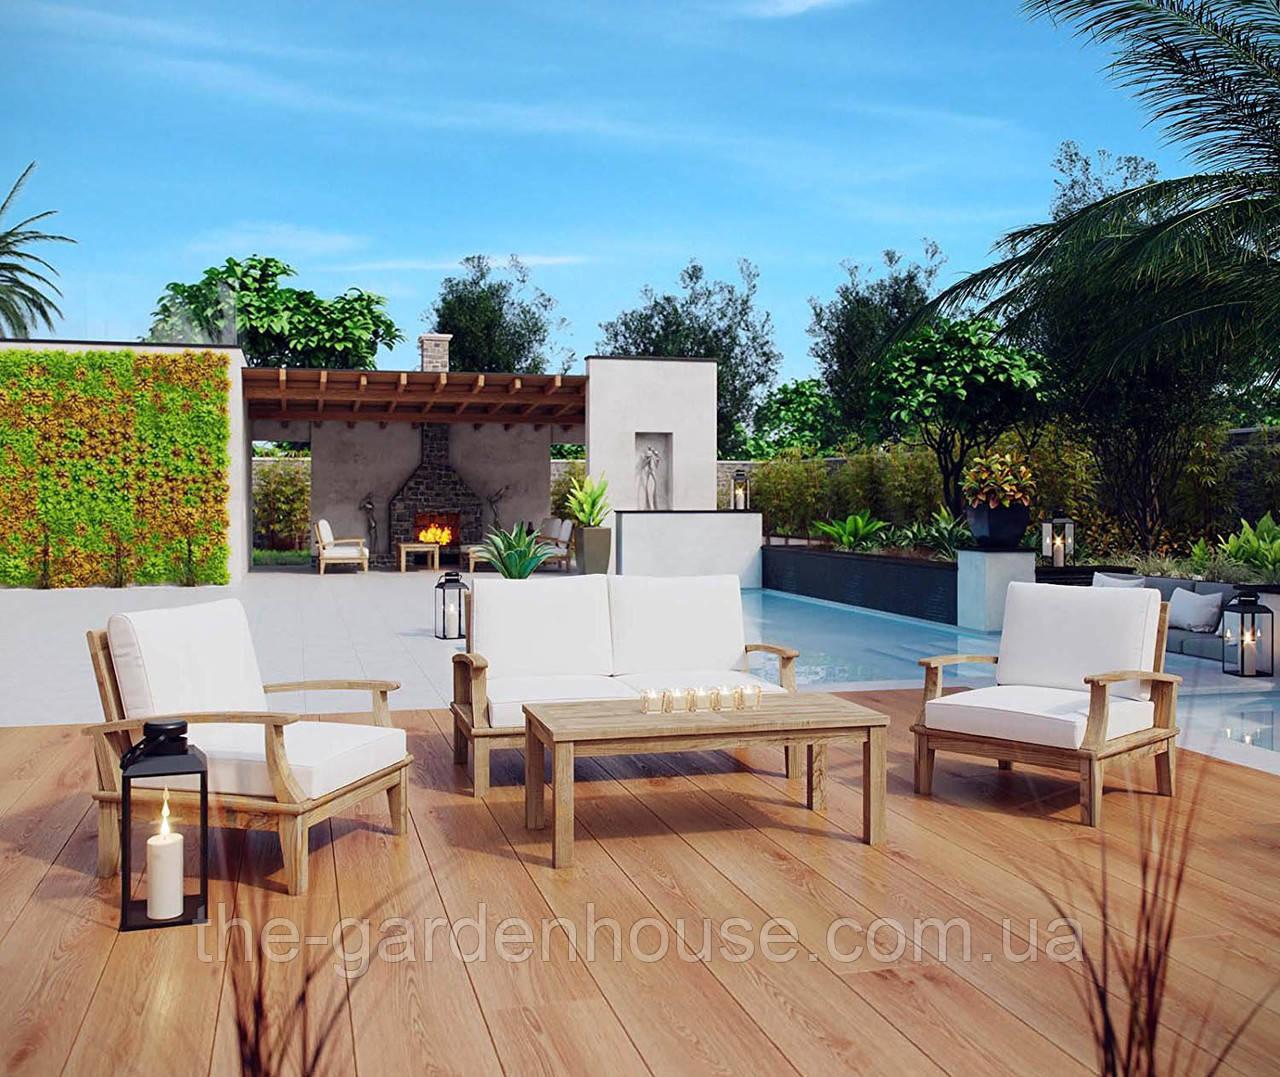 Садовый набор мебели Selbi из тика с подушками